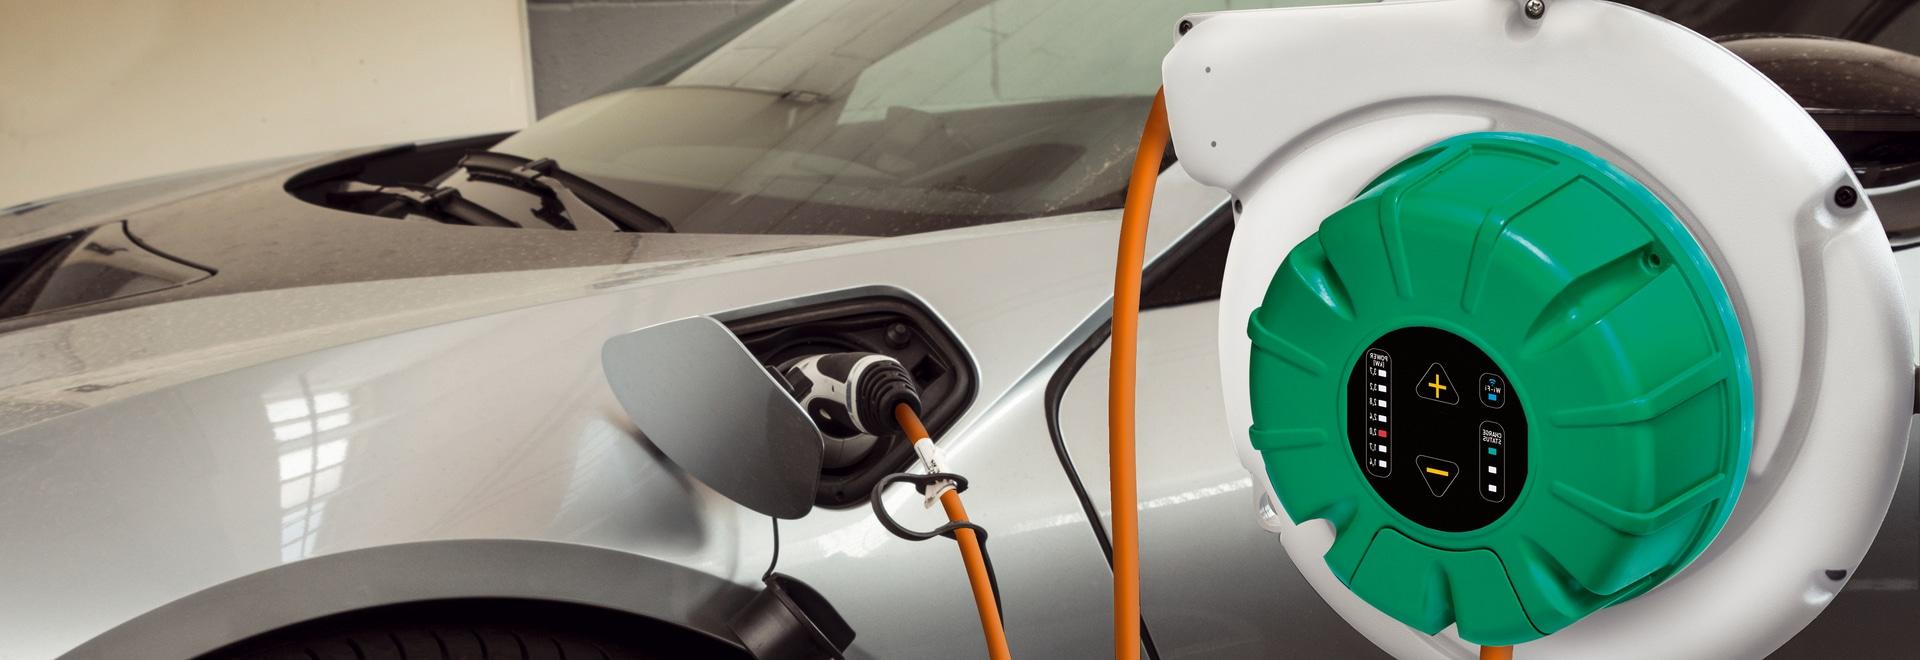 ERV Ladung grüne Fahrzeuge